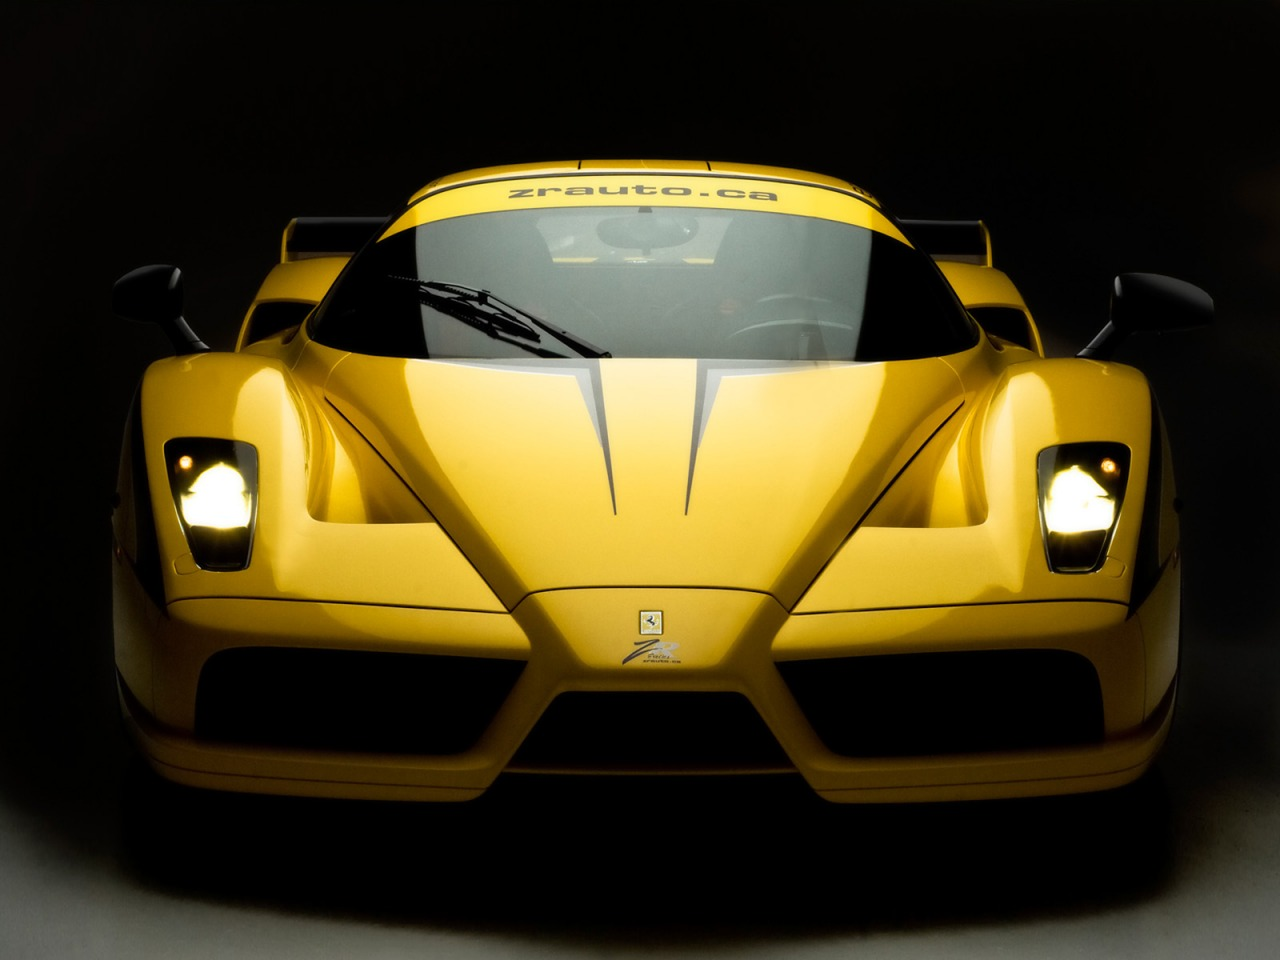 Cars Wallpapers: Edo Competition Ferrari Enzo XX Evolution Wallpaper